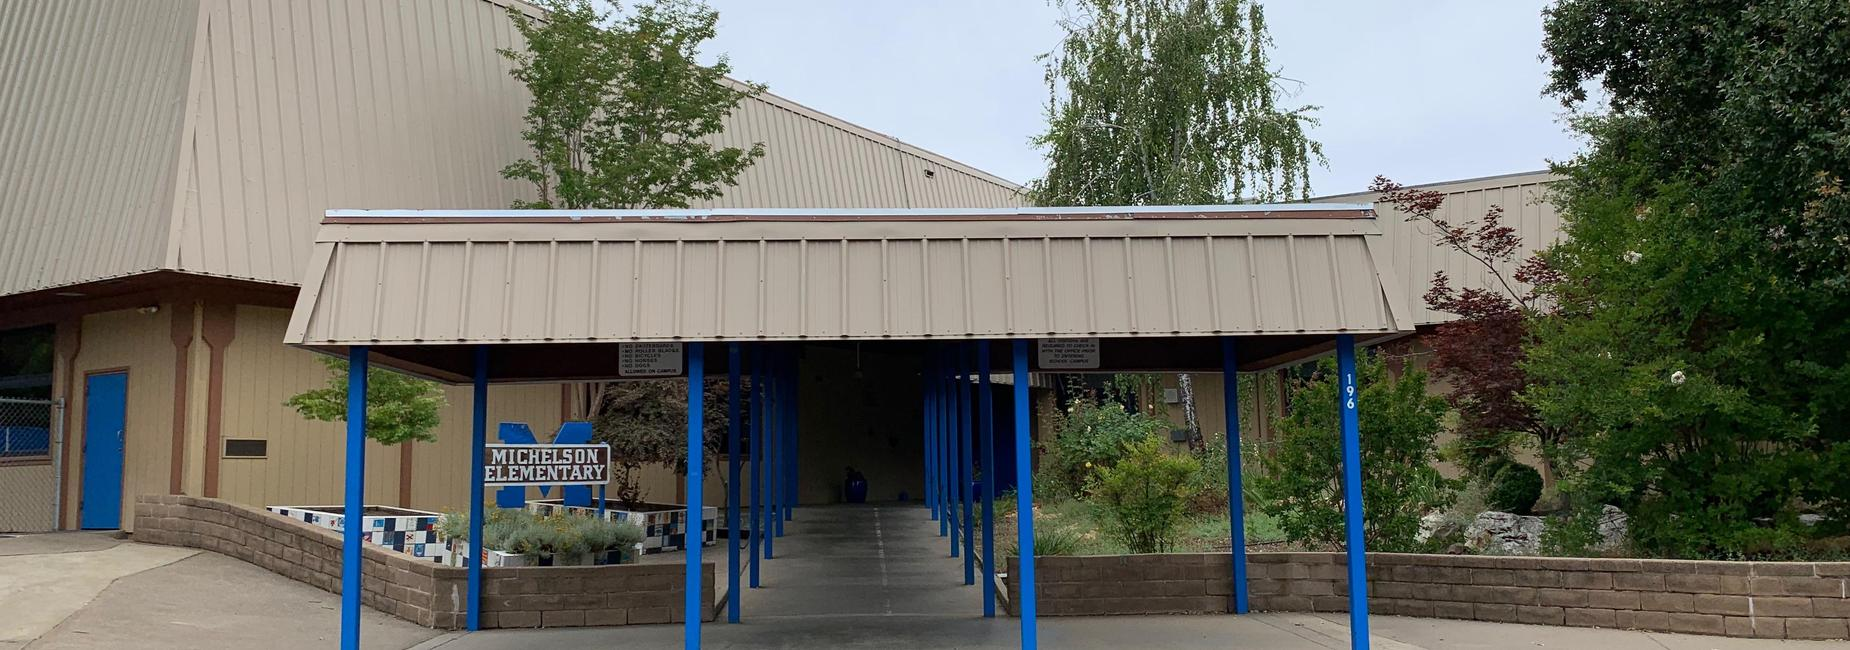 Albert Michelson Elementary